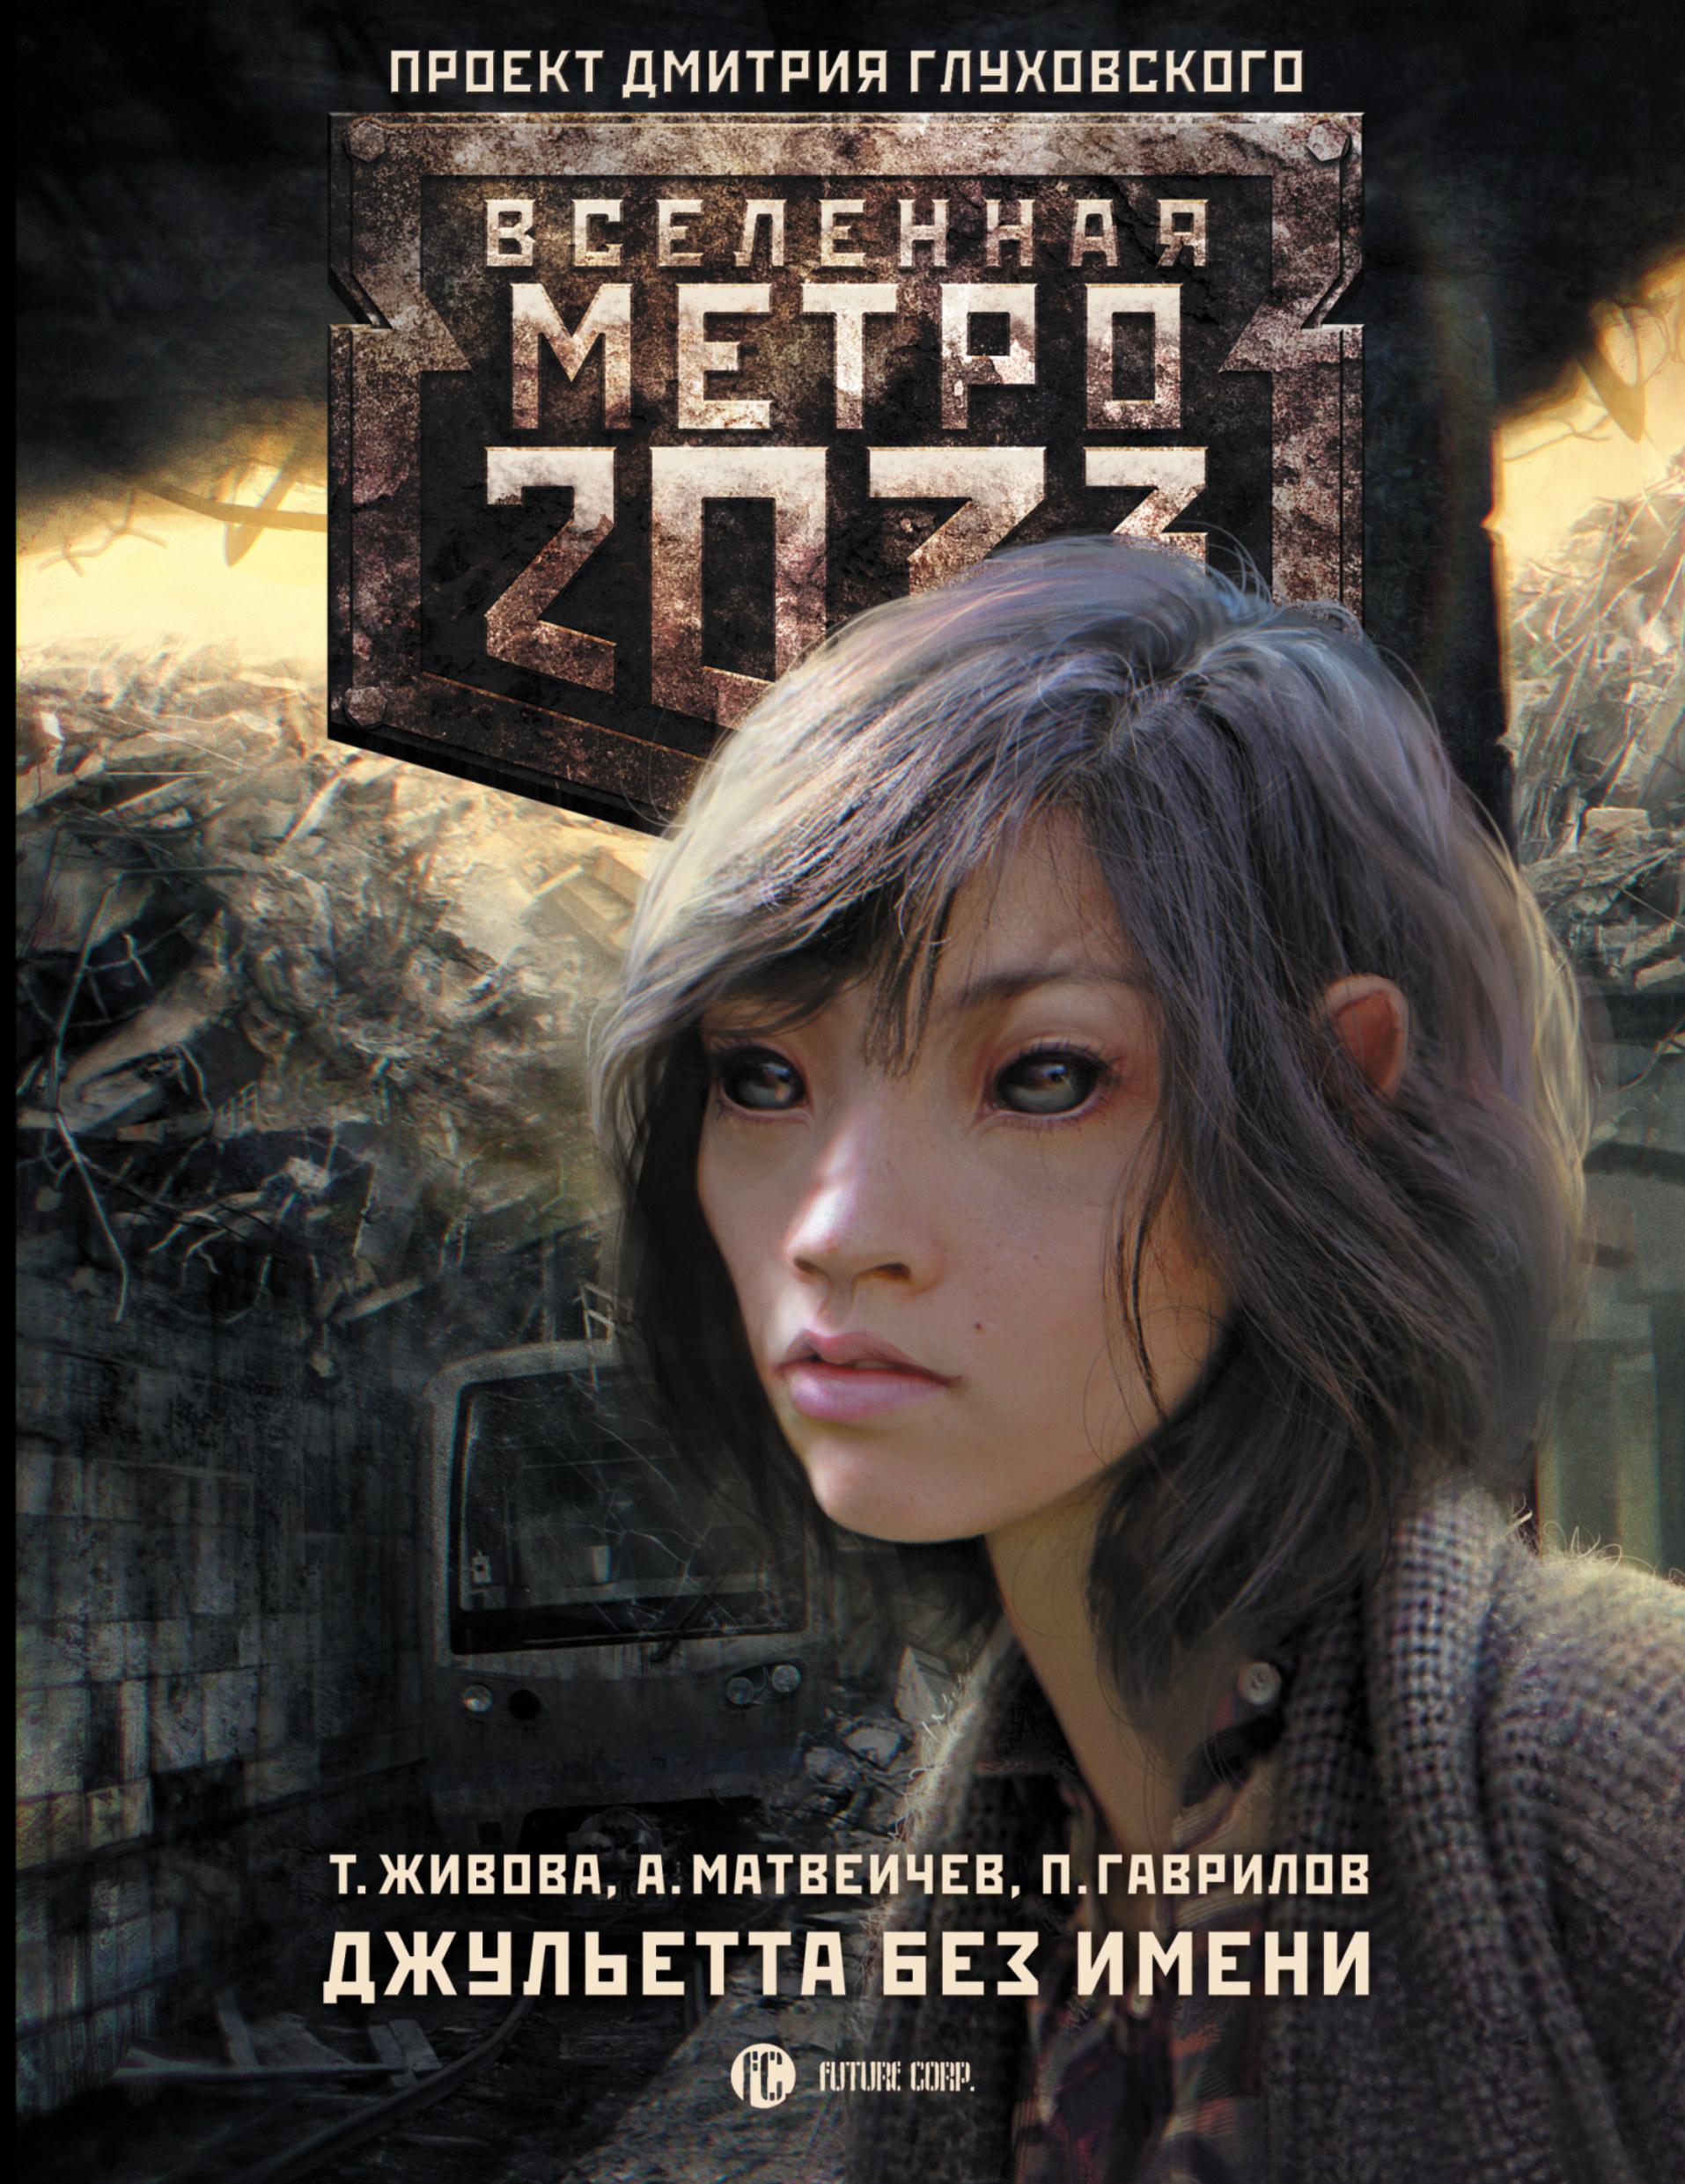 Живова Т.В. Метро 2033: Джульетта без имени макаров п метро 2033 перекрестки судьбы фантастический роман